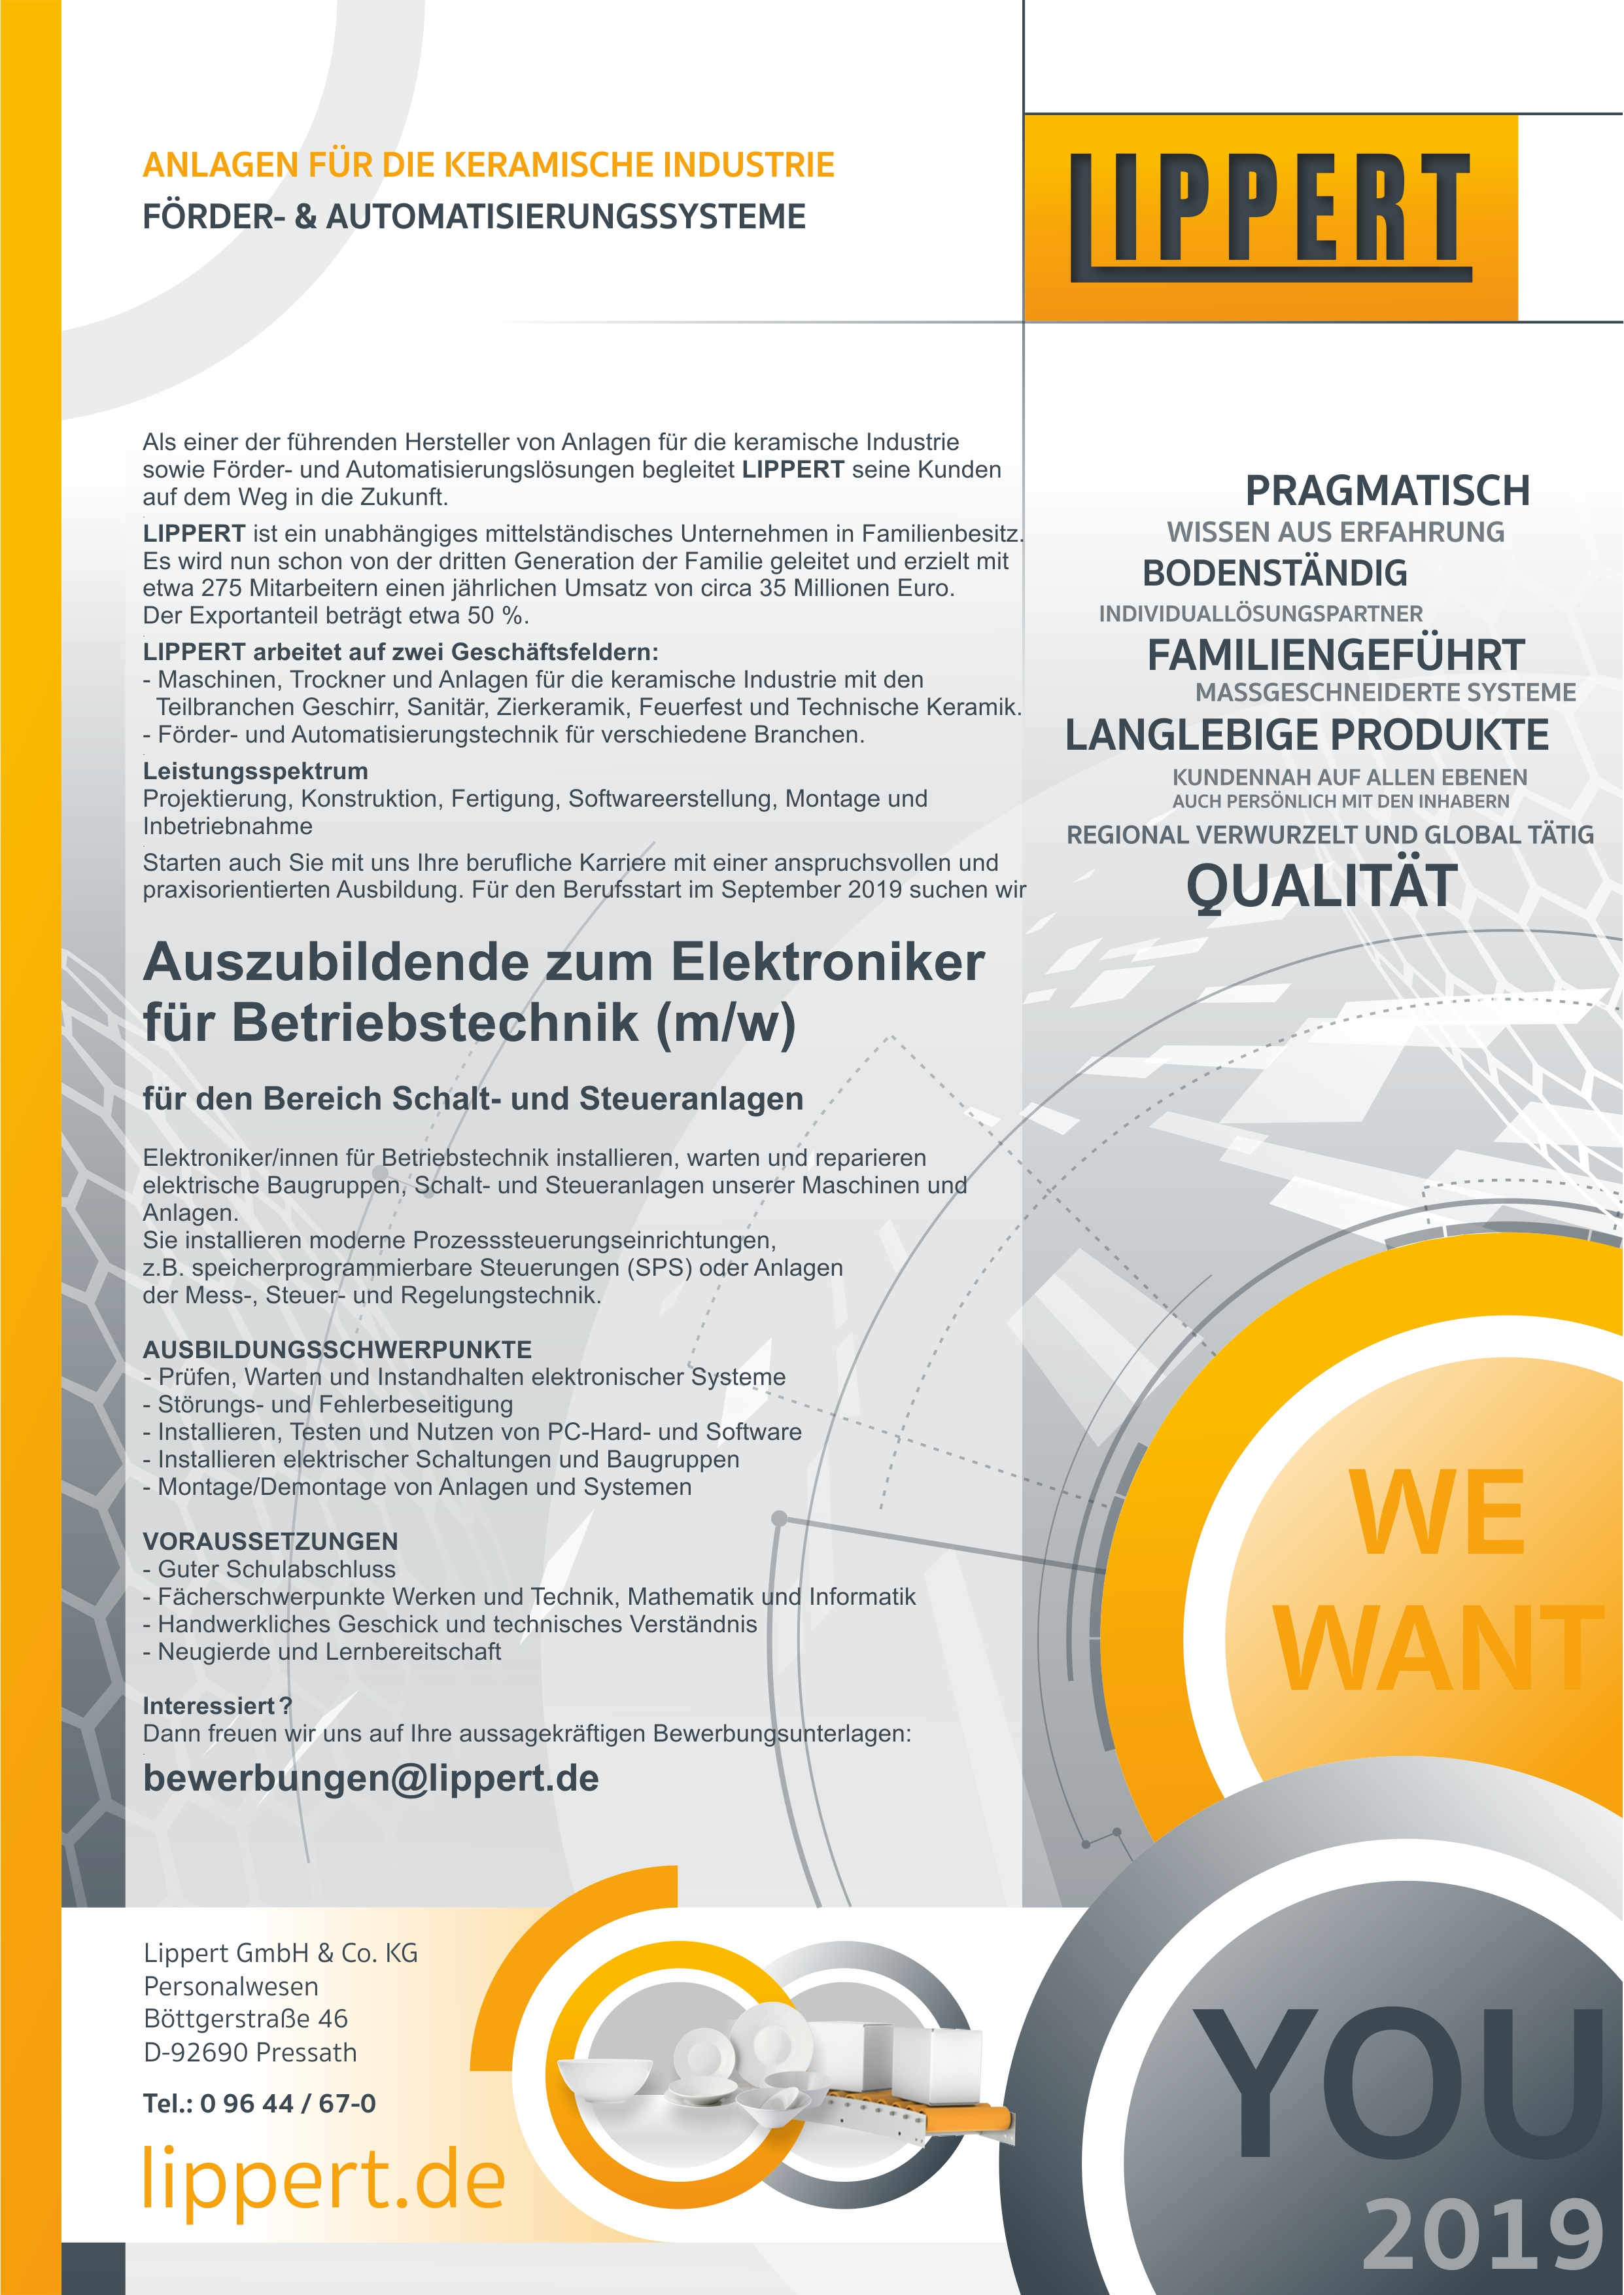 Elektroniker für Betriebstechnik (m/w/d)